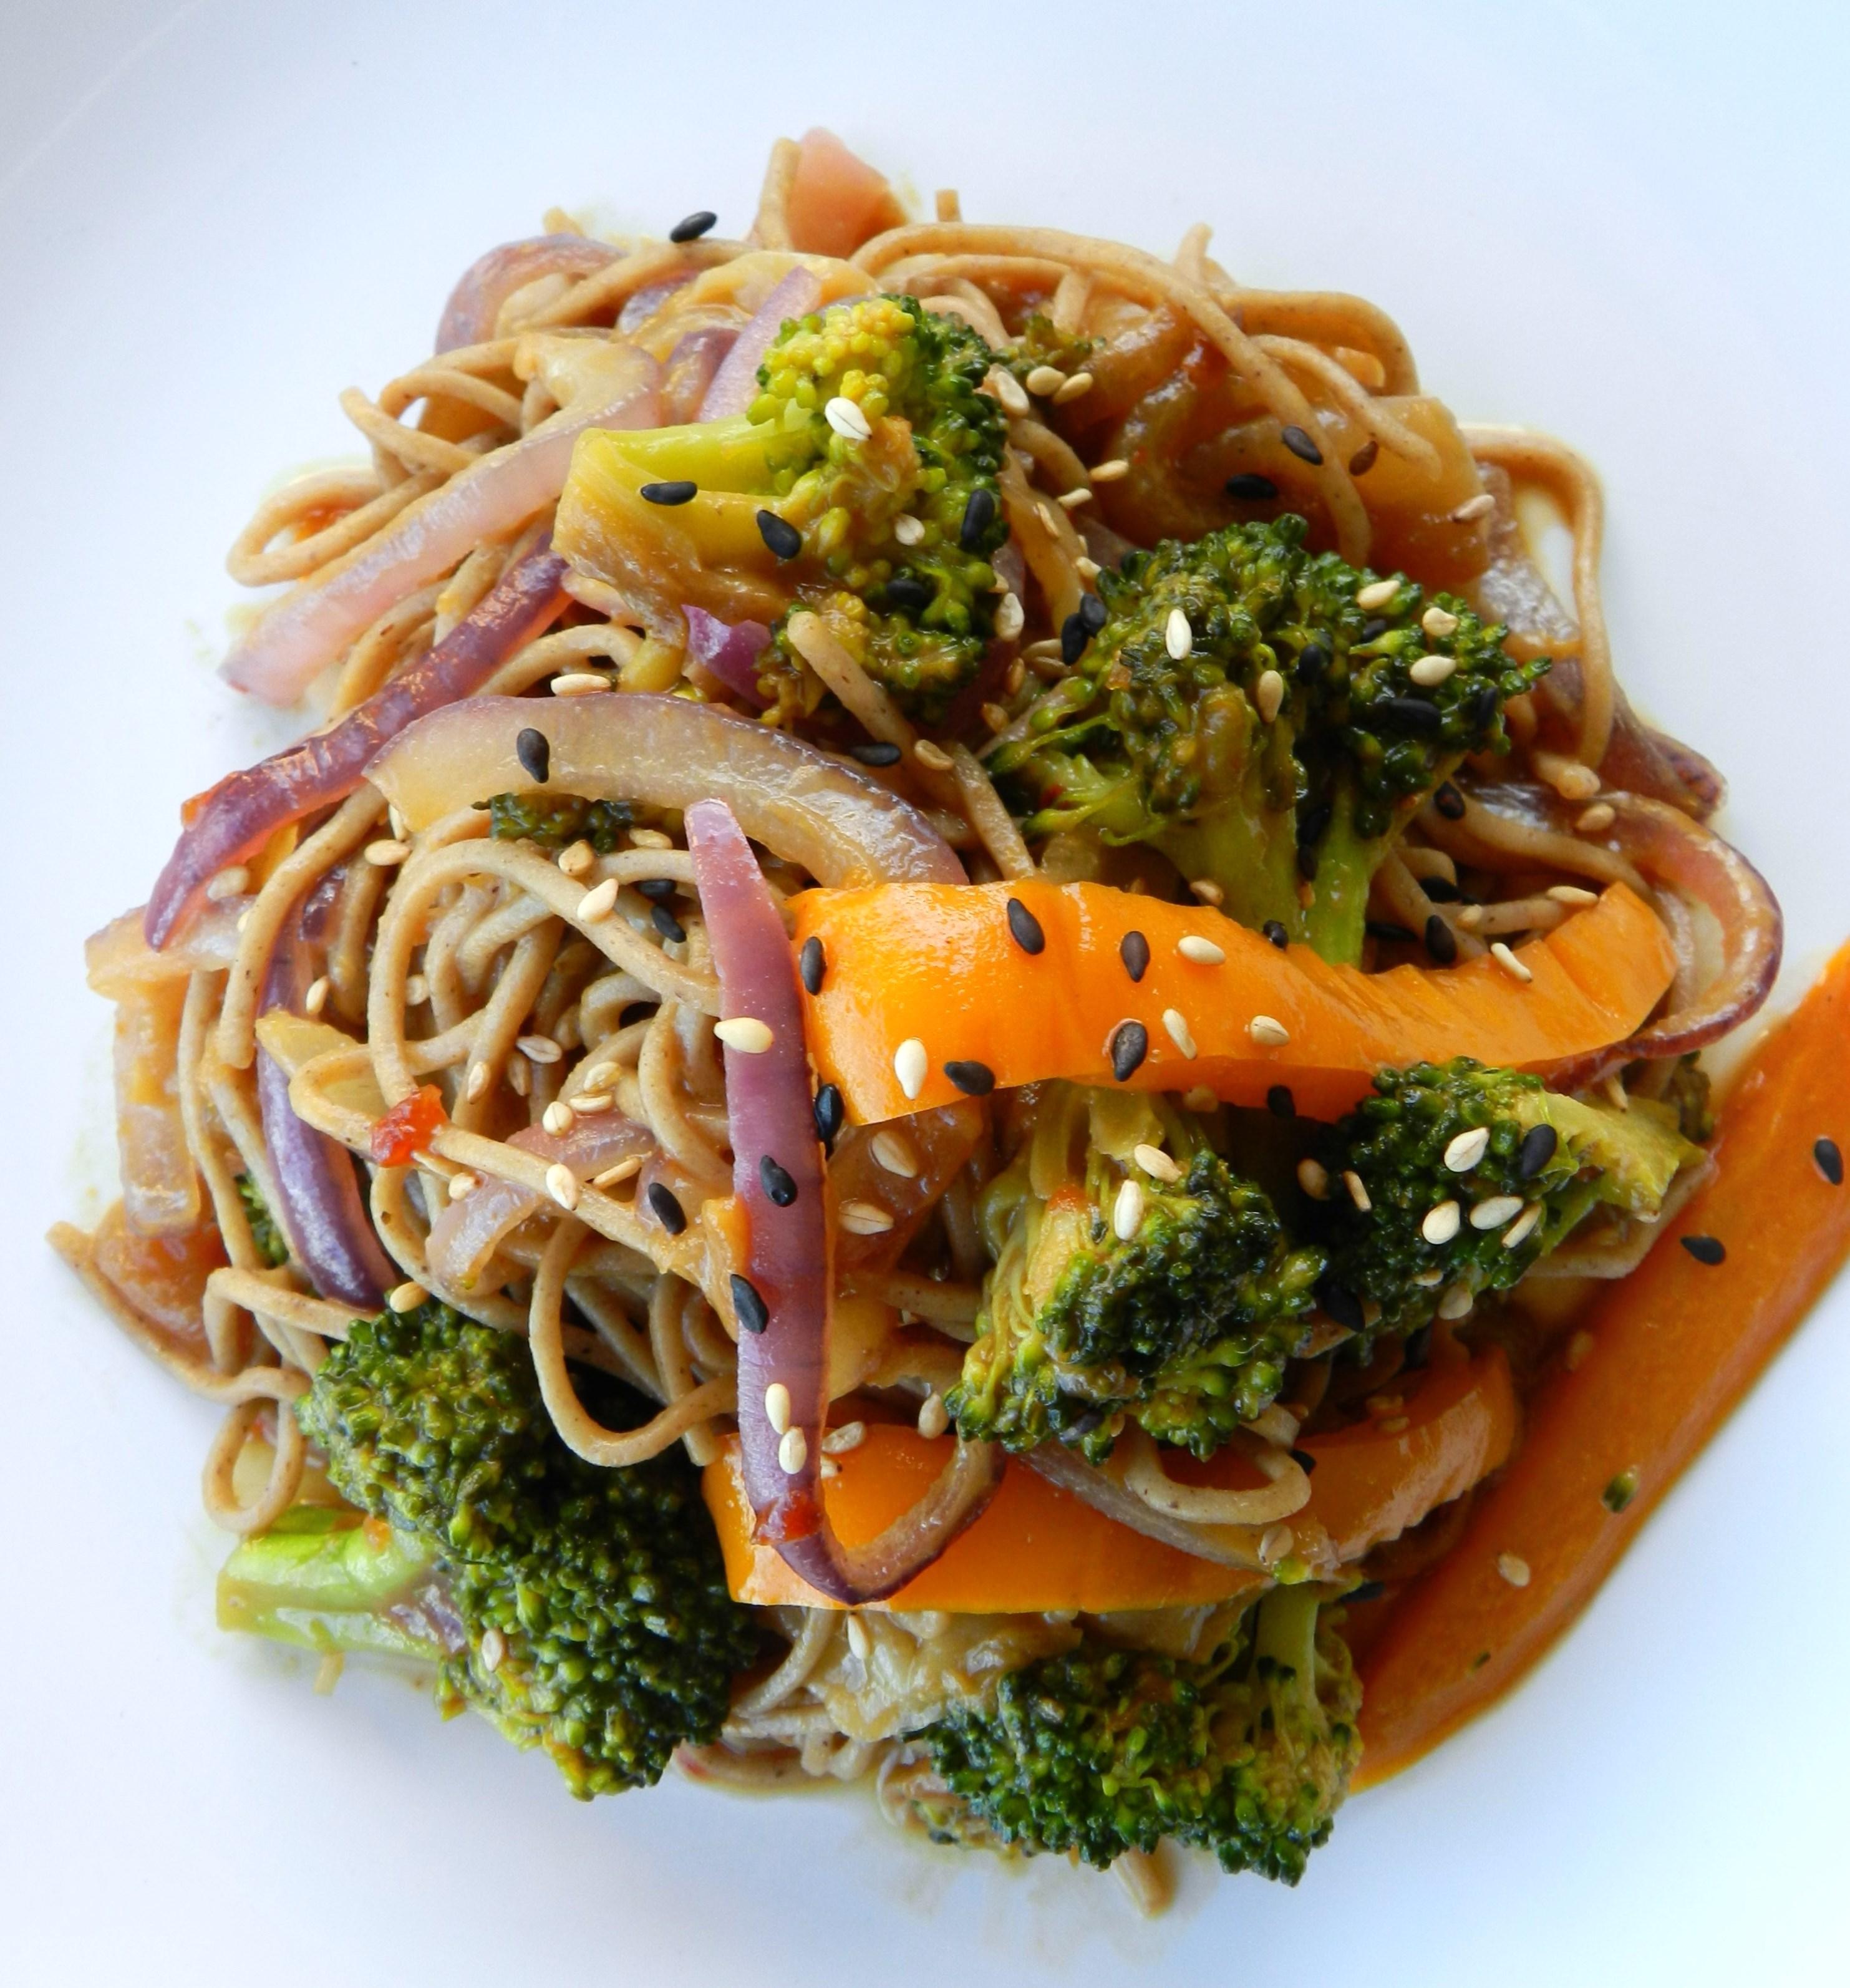 soba noodles with stir-fried vegetables - Pook's Pantry